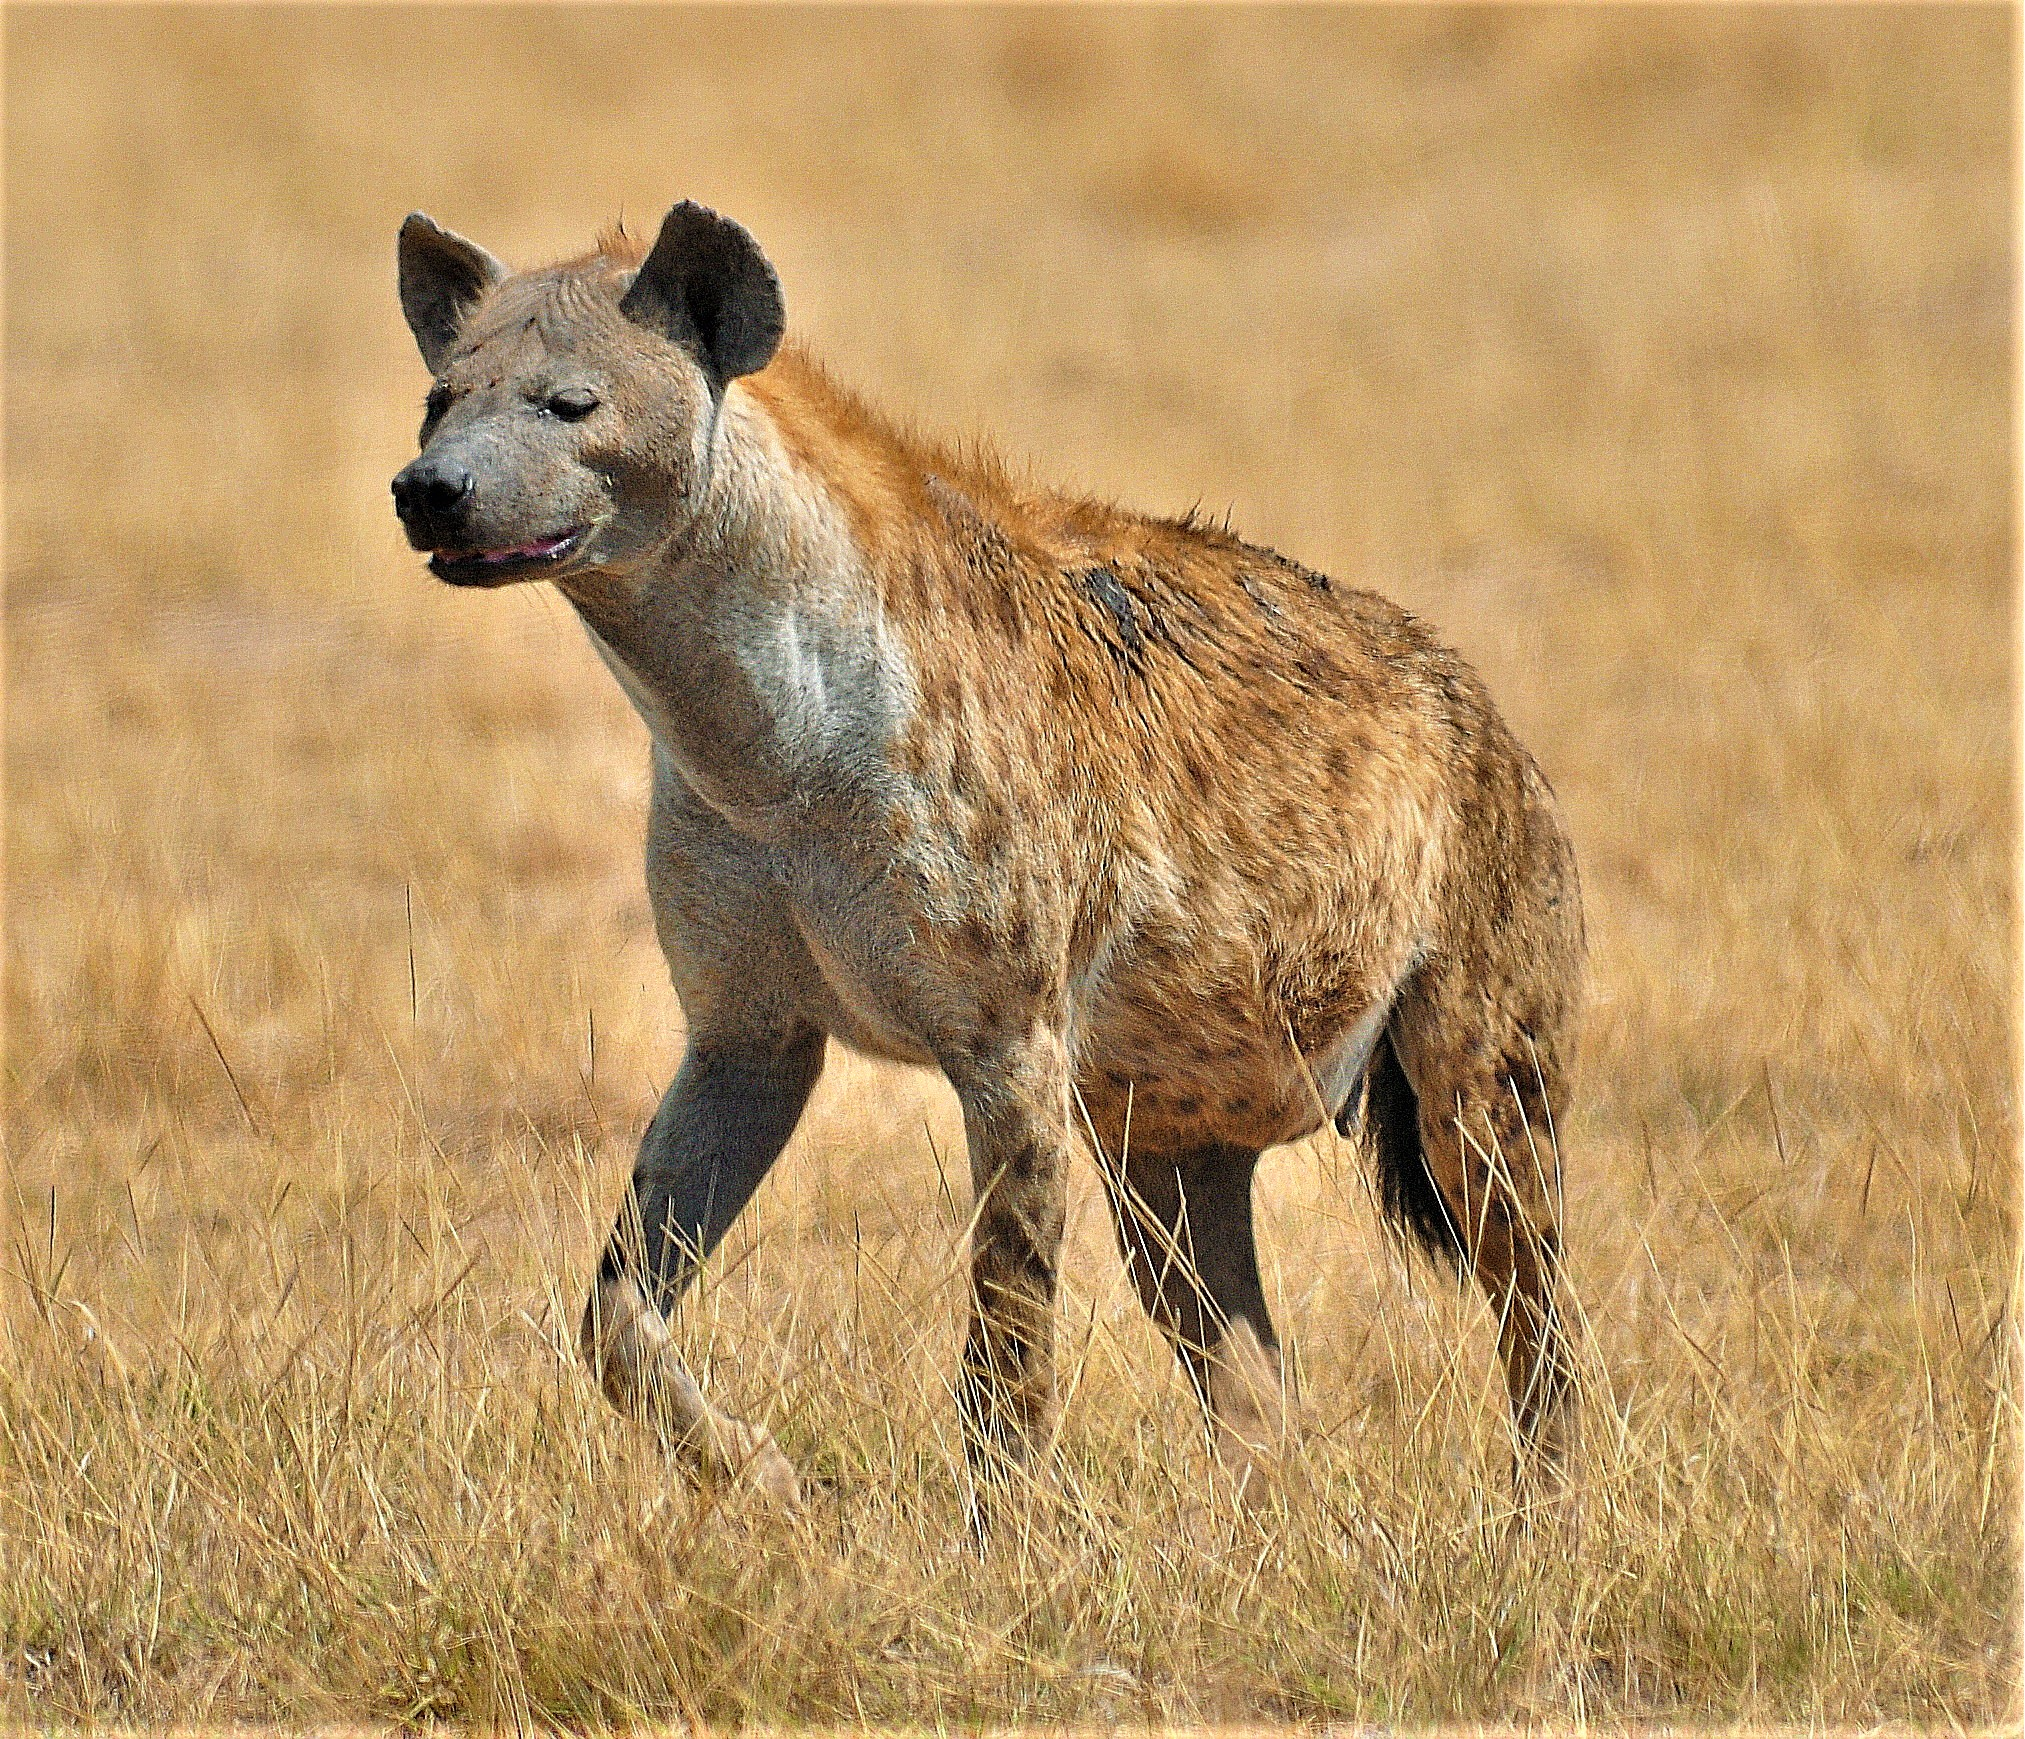 le iene femmine hanno un pene